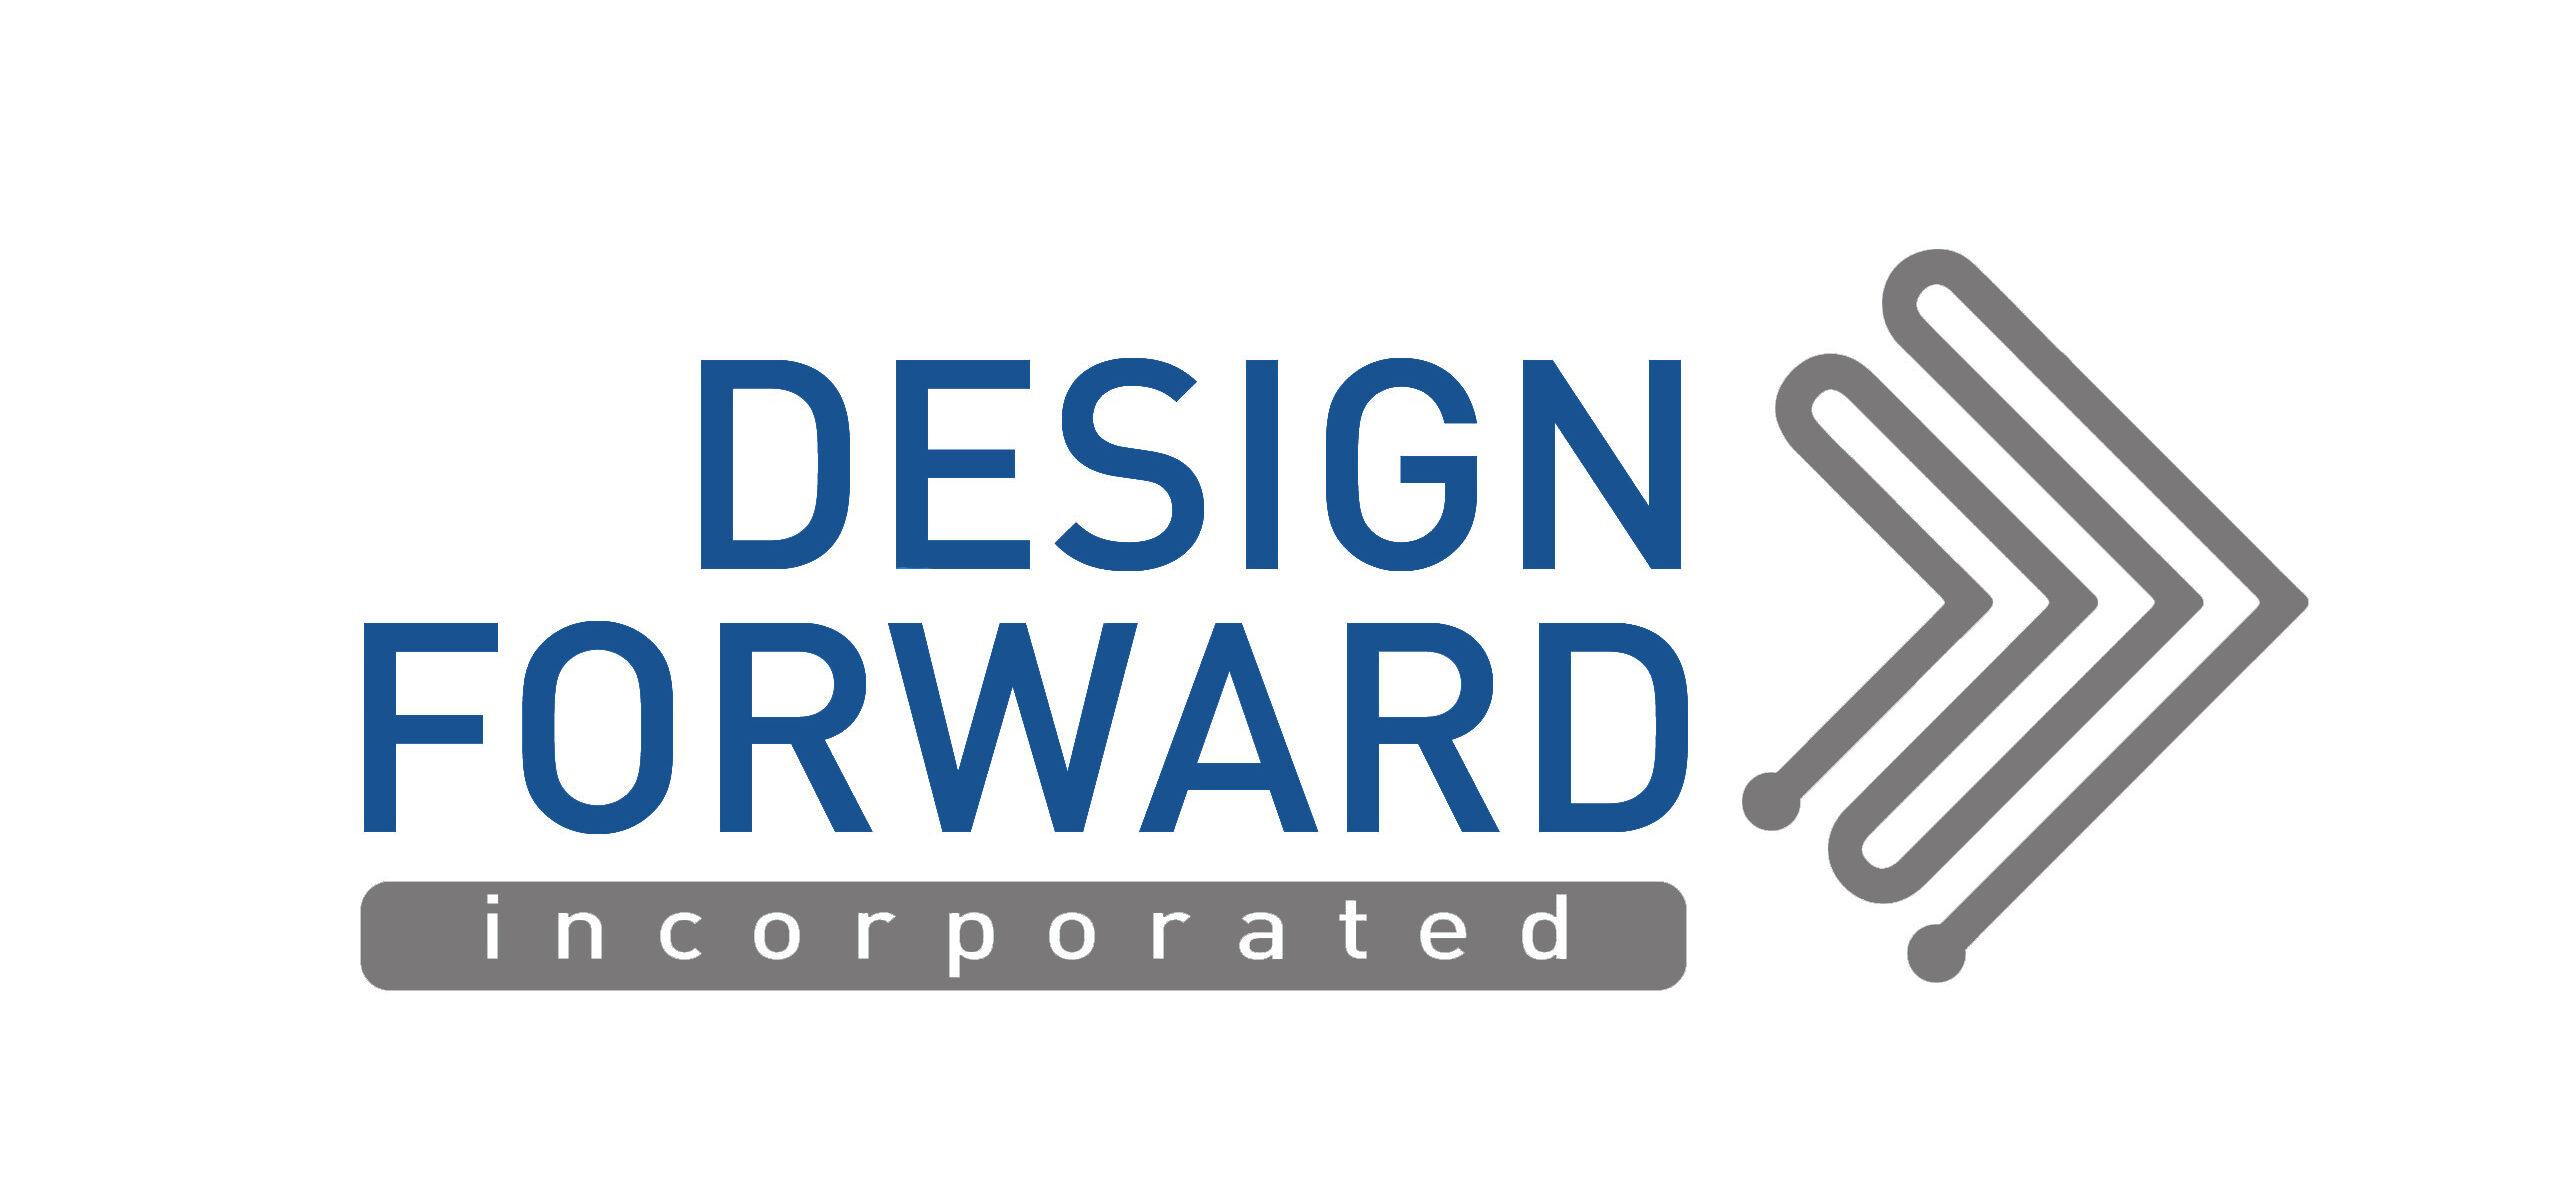 Design Forward, Inc.